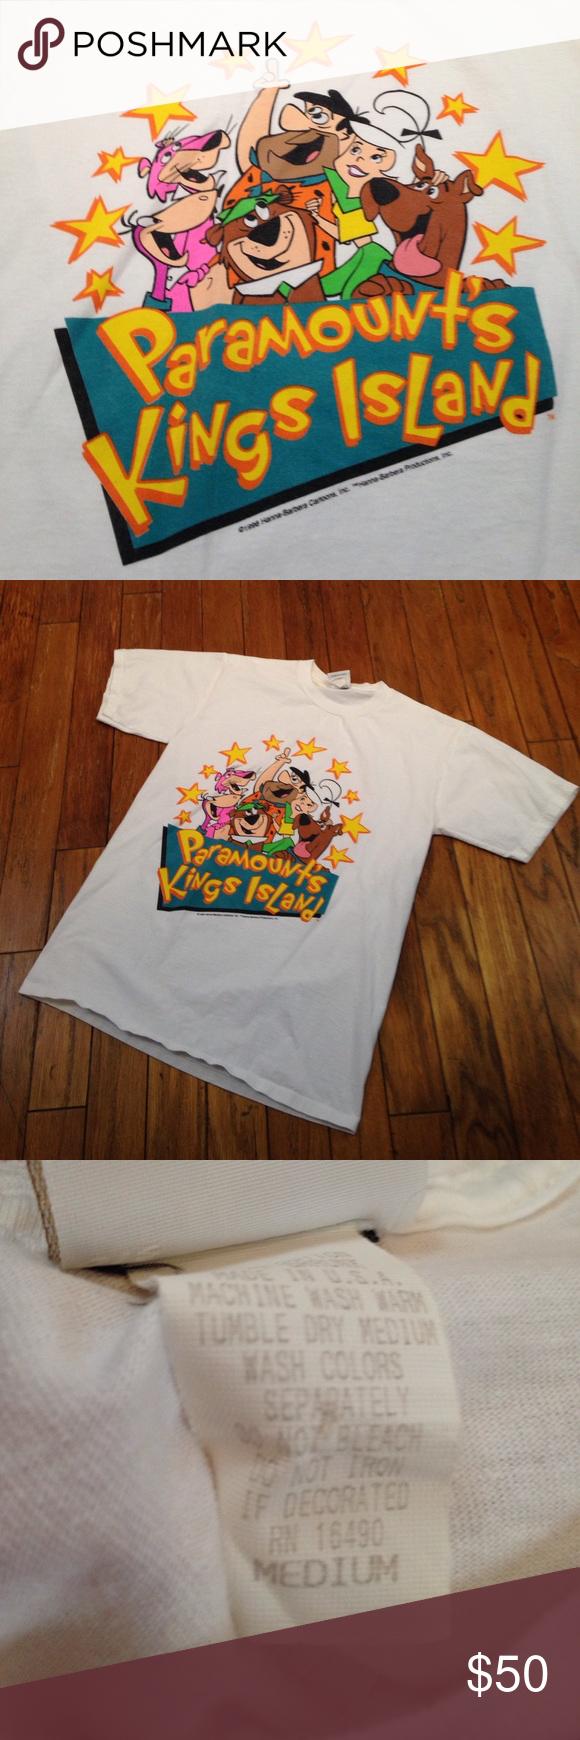 90s Vintage Paramount Kings Island T Shirt Medium Kings Island Roller Coaster Theme Vintage